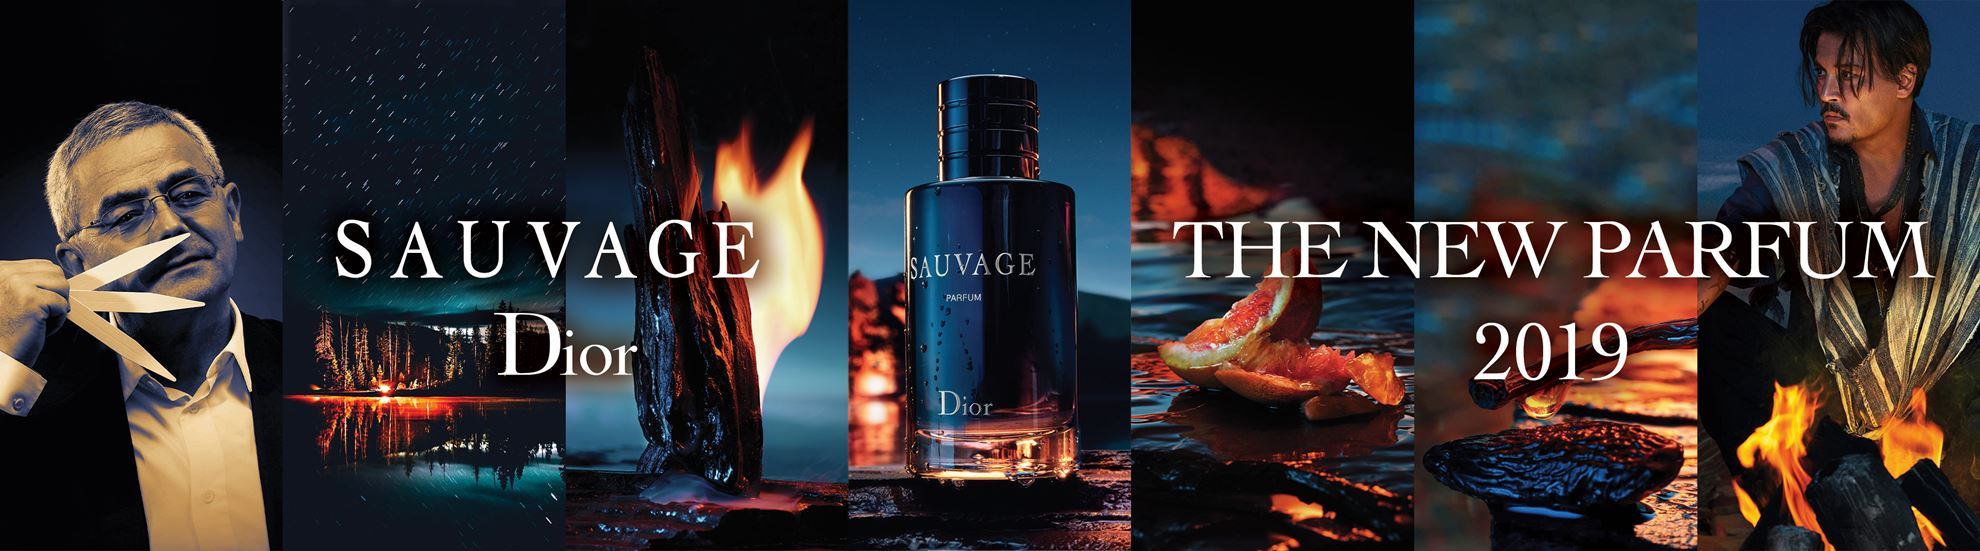 Dior Sauvage Parfum 2019